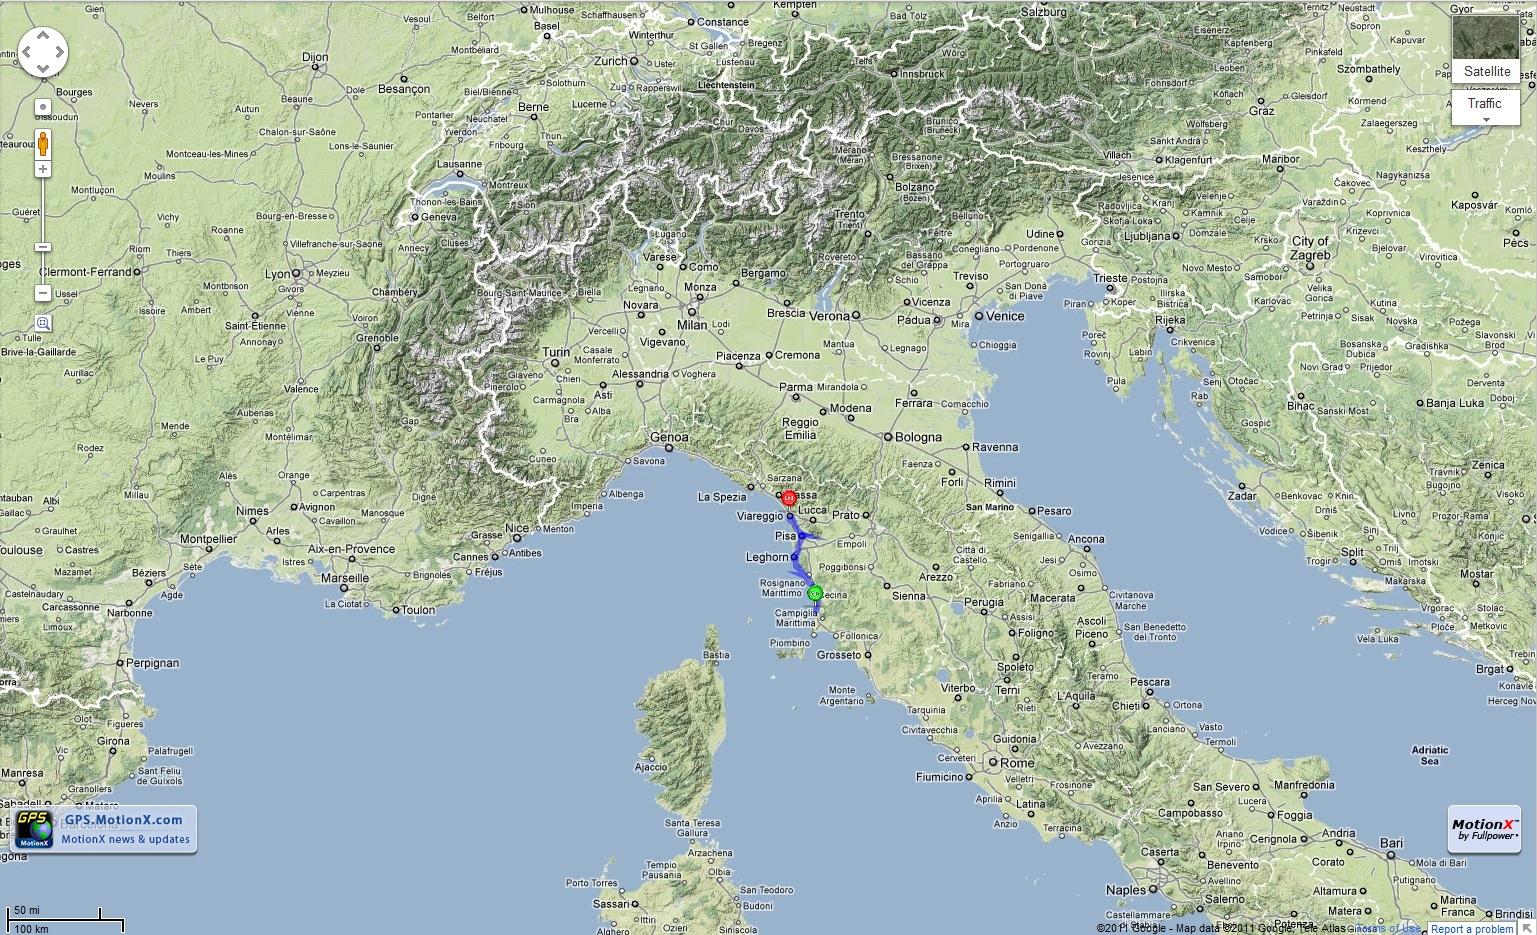 Nedly on his Treadly San Vincenzo to Viareggio